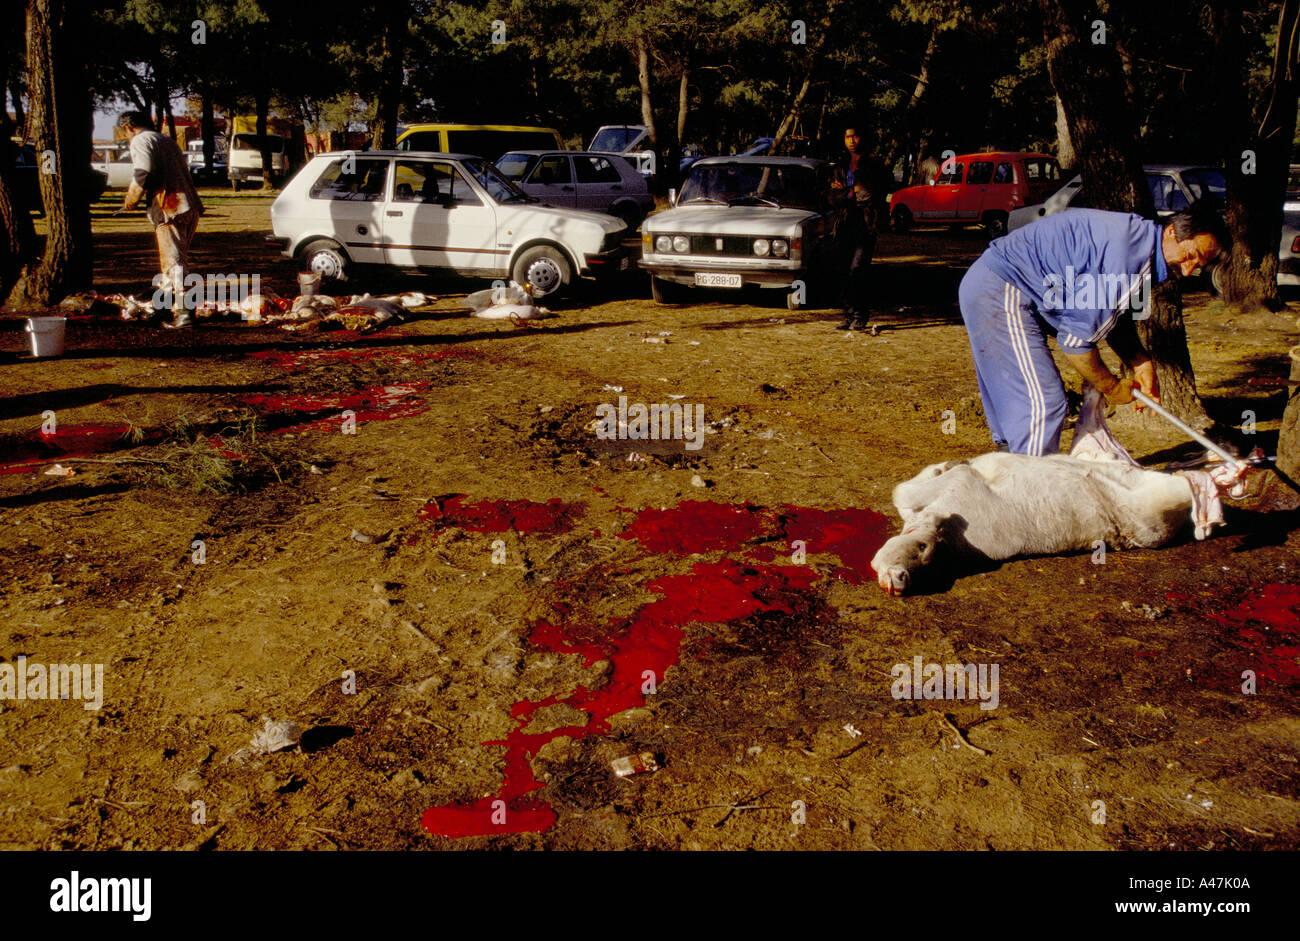 La Credenza Podgorica : Slaughtering animals immagini fotos stock